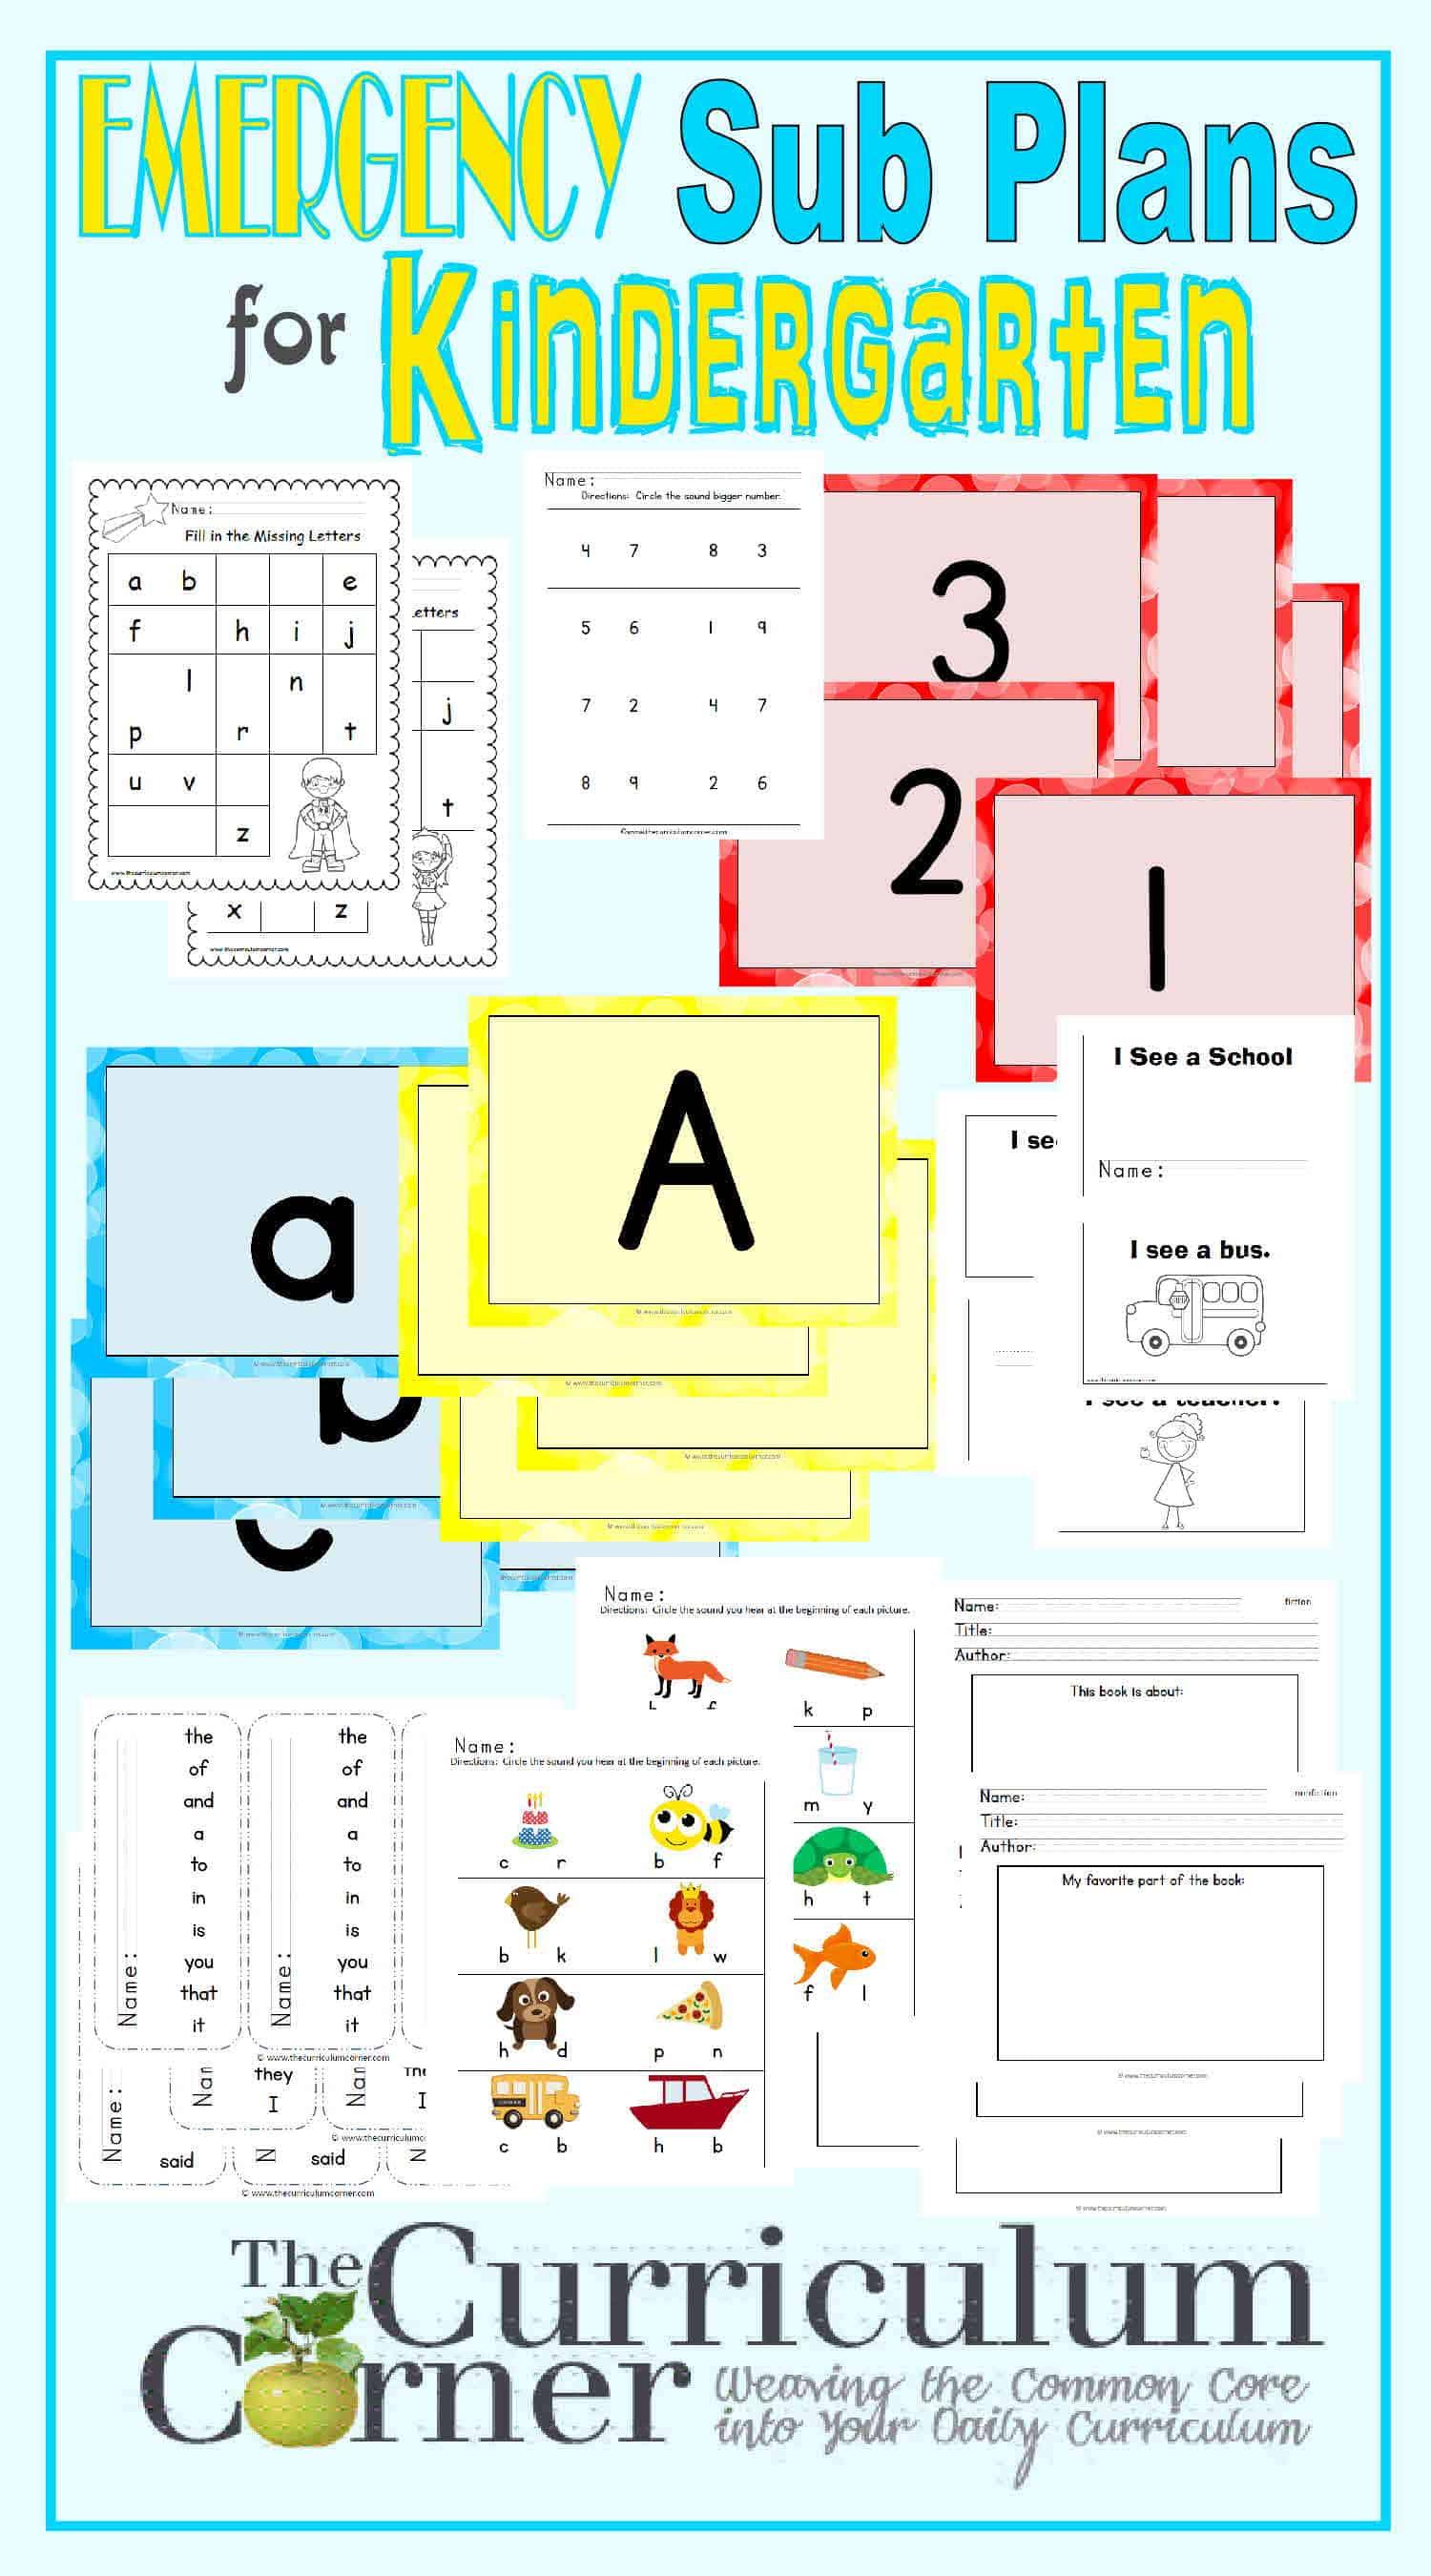 Kindergarten Emergency Sub Plans